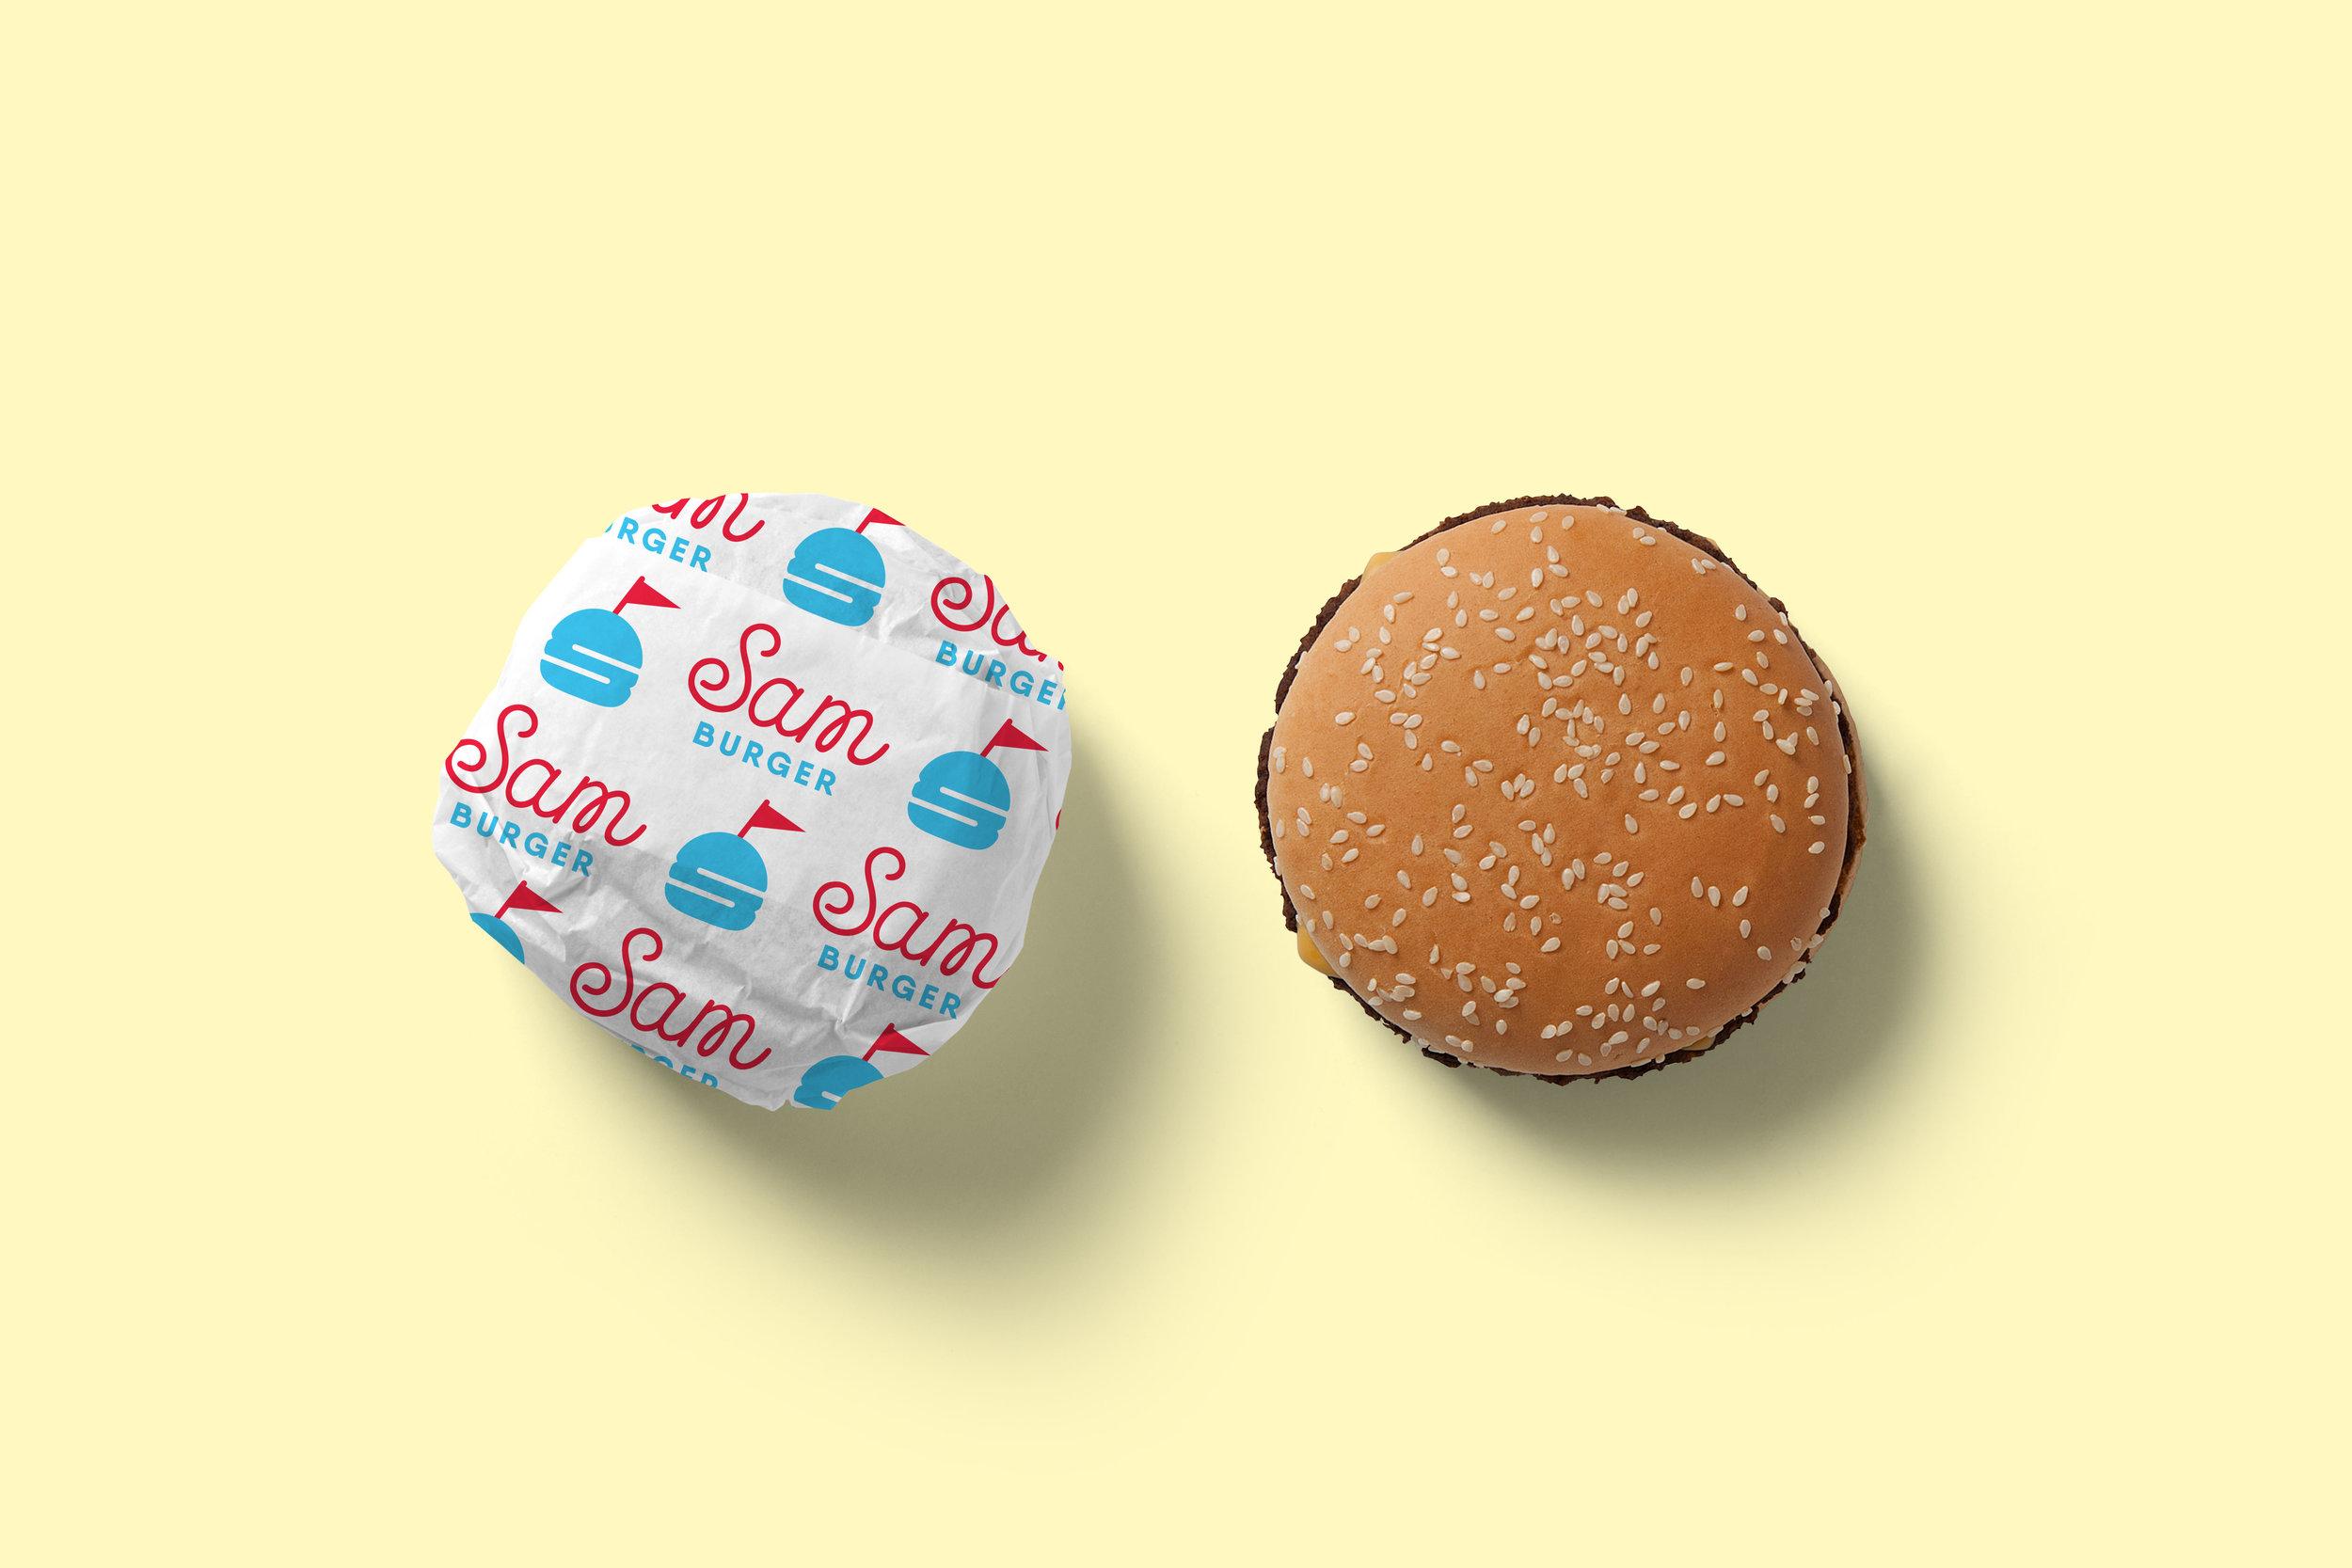 Samburger_WrappedBurger.jpg